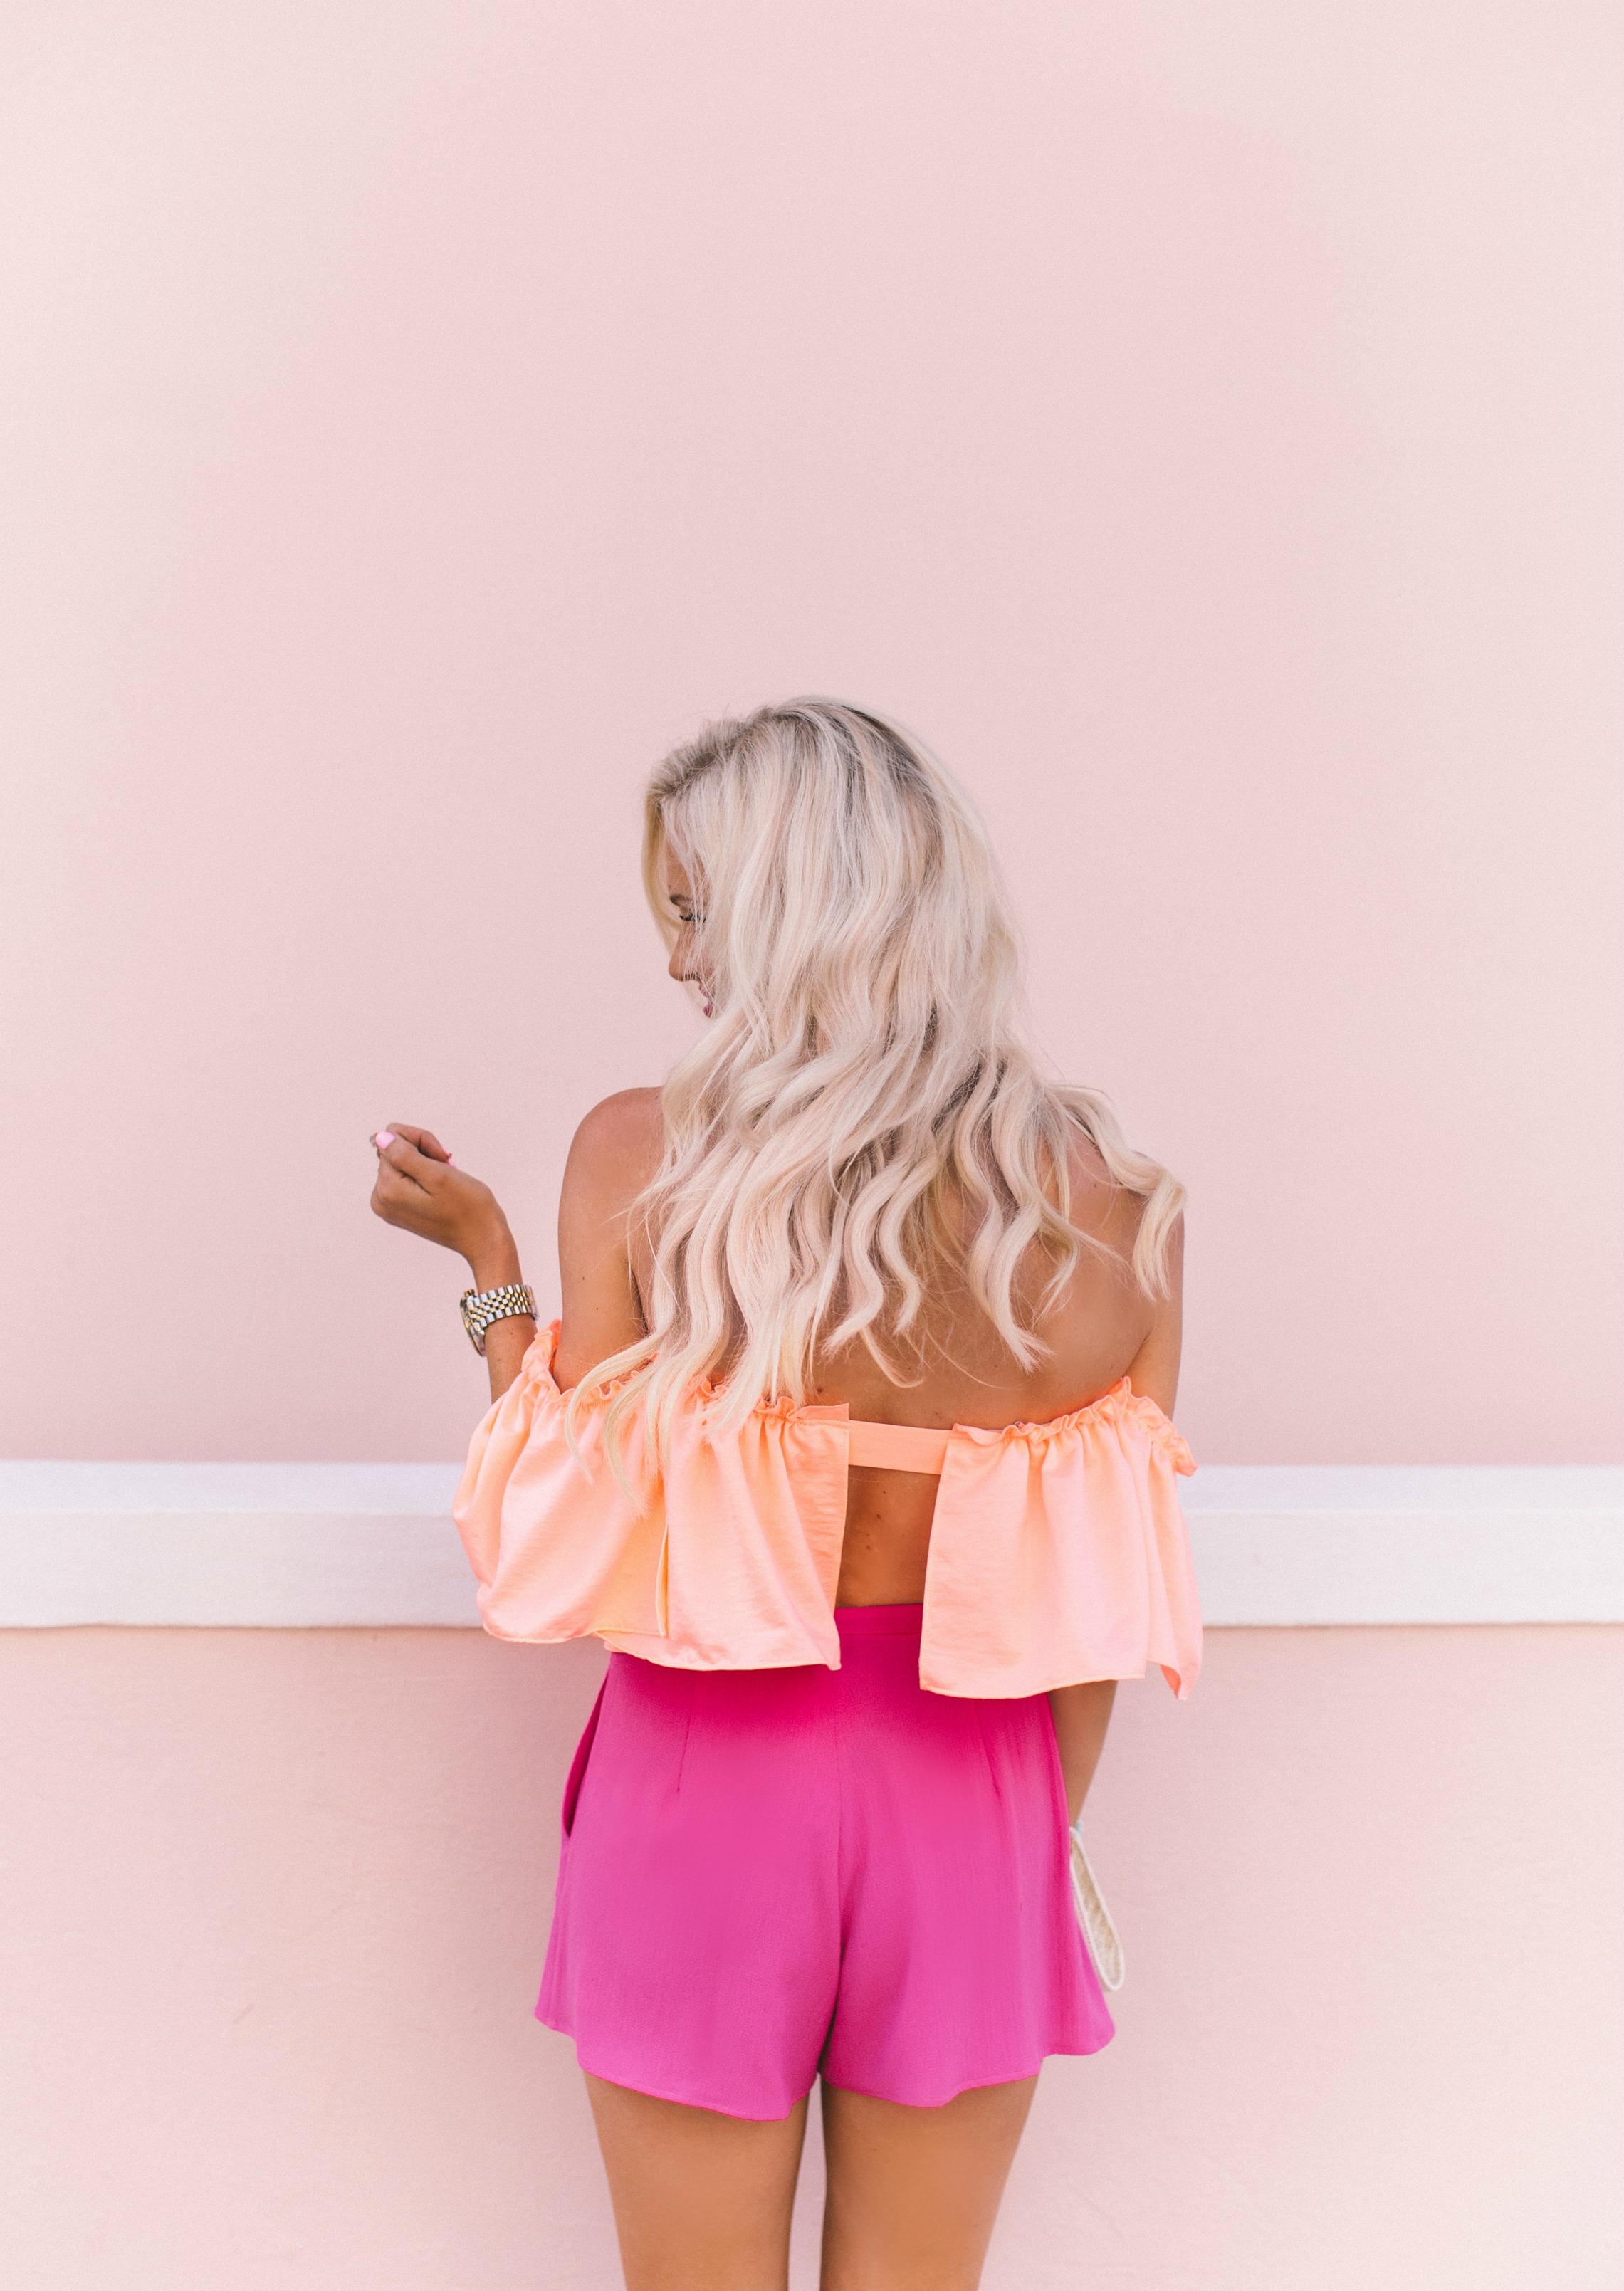 Coral Off The Shoulder Ruffled Top Hot Pink Shorts